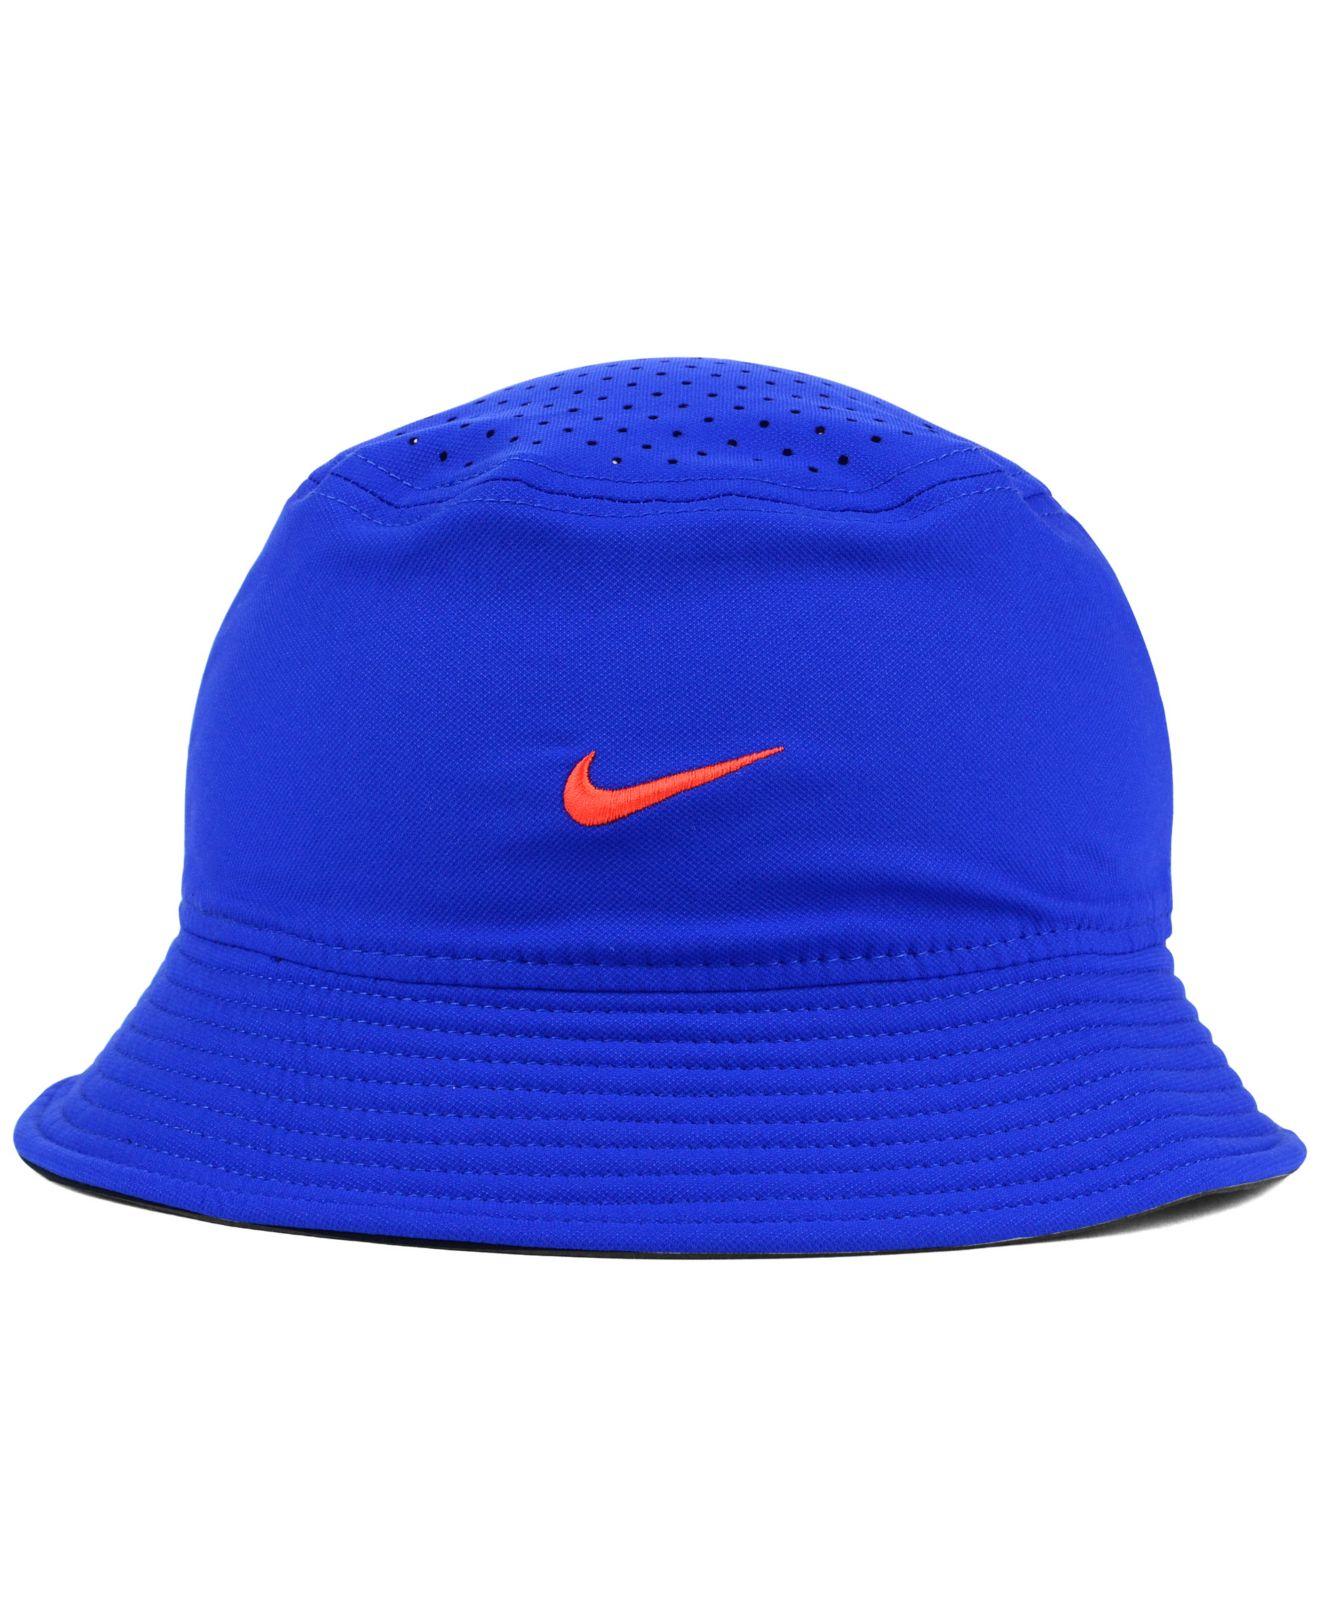 ebb5ed03 Nike Florida Gators Vapor Bucket Hat in Blue for Men - Lyst